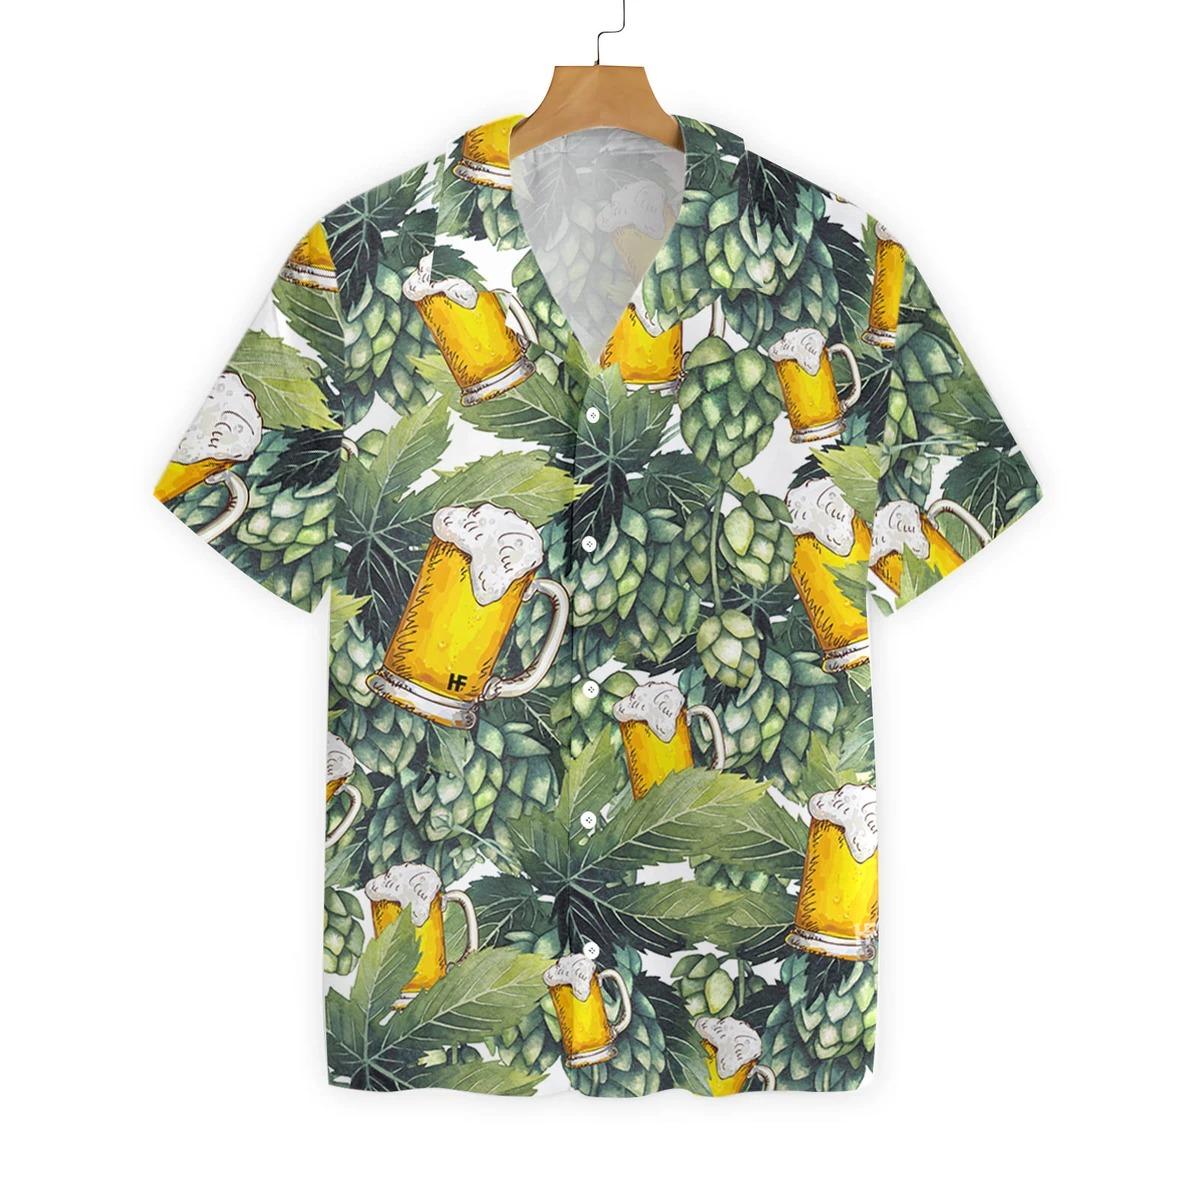 Hops and craft beer hawaiian shirt